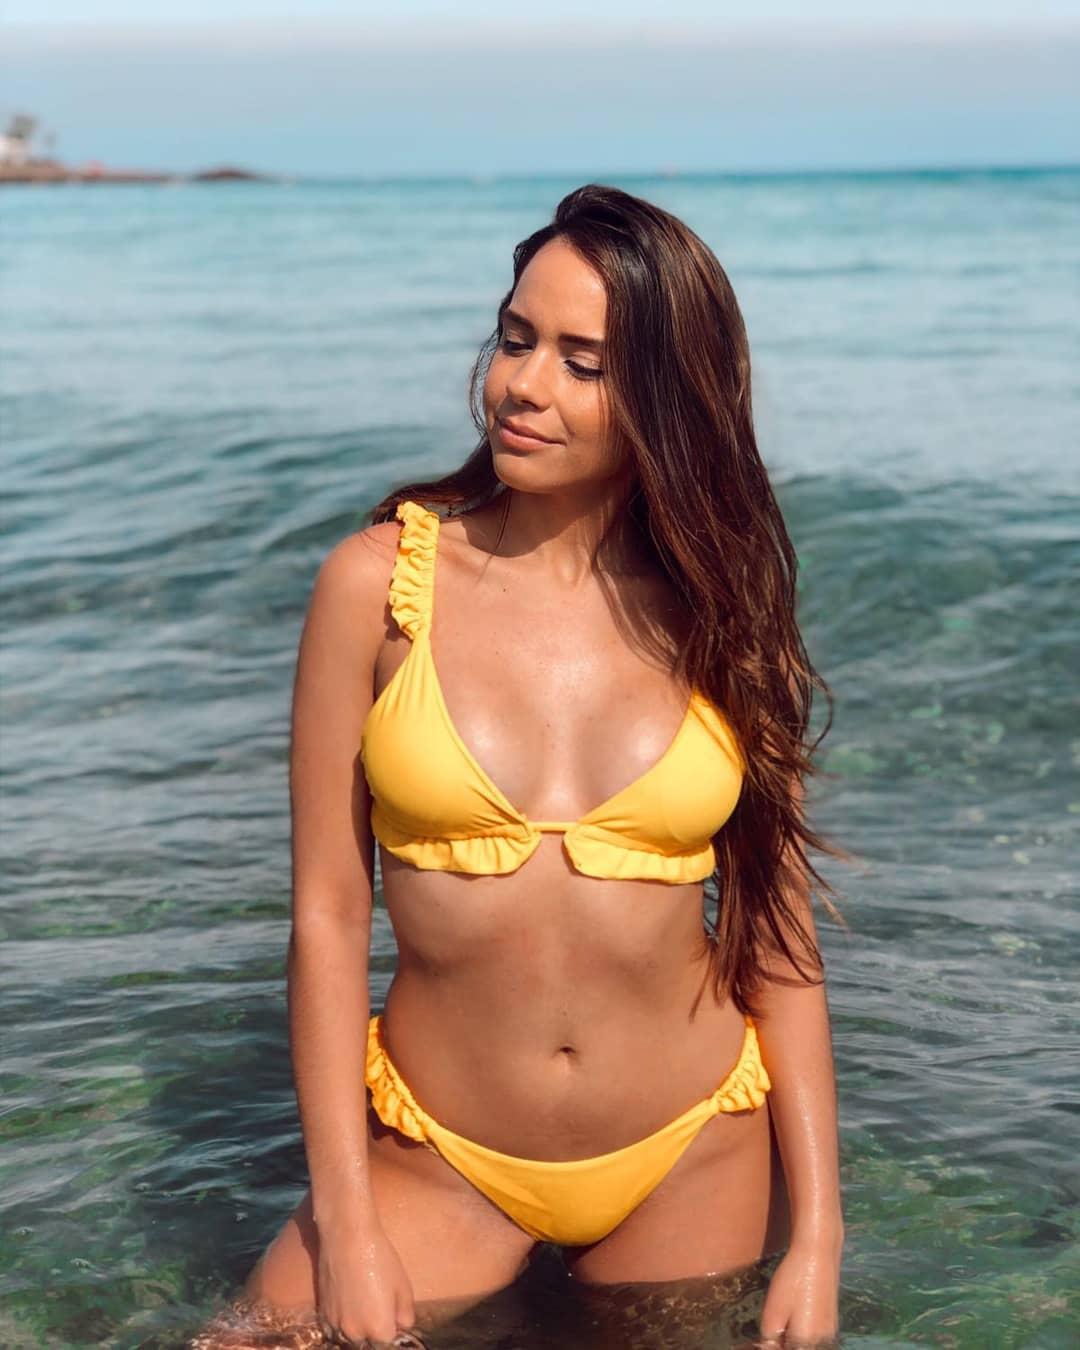 marta lorenzo, miss earth spain 2020/1st runner-up de world beauty queen 2018/miss eco espana 2017. - Página 5 Martal14